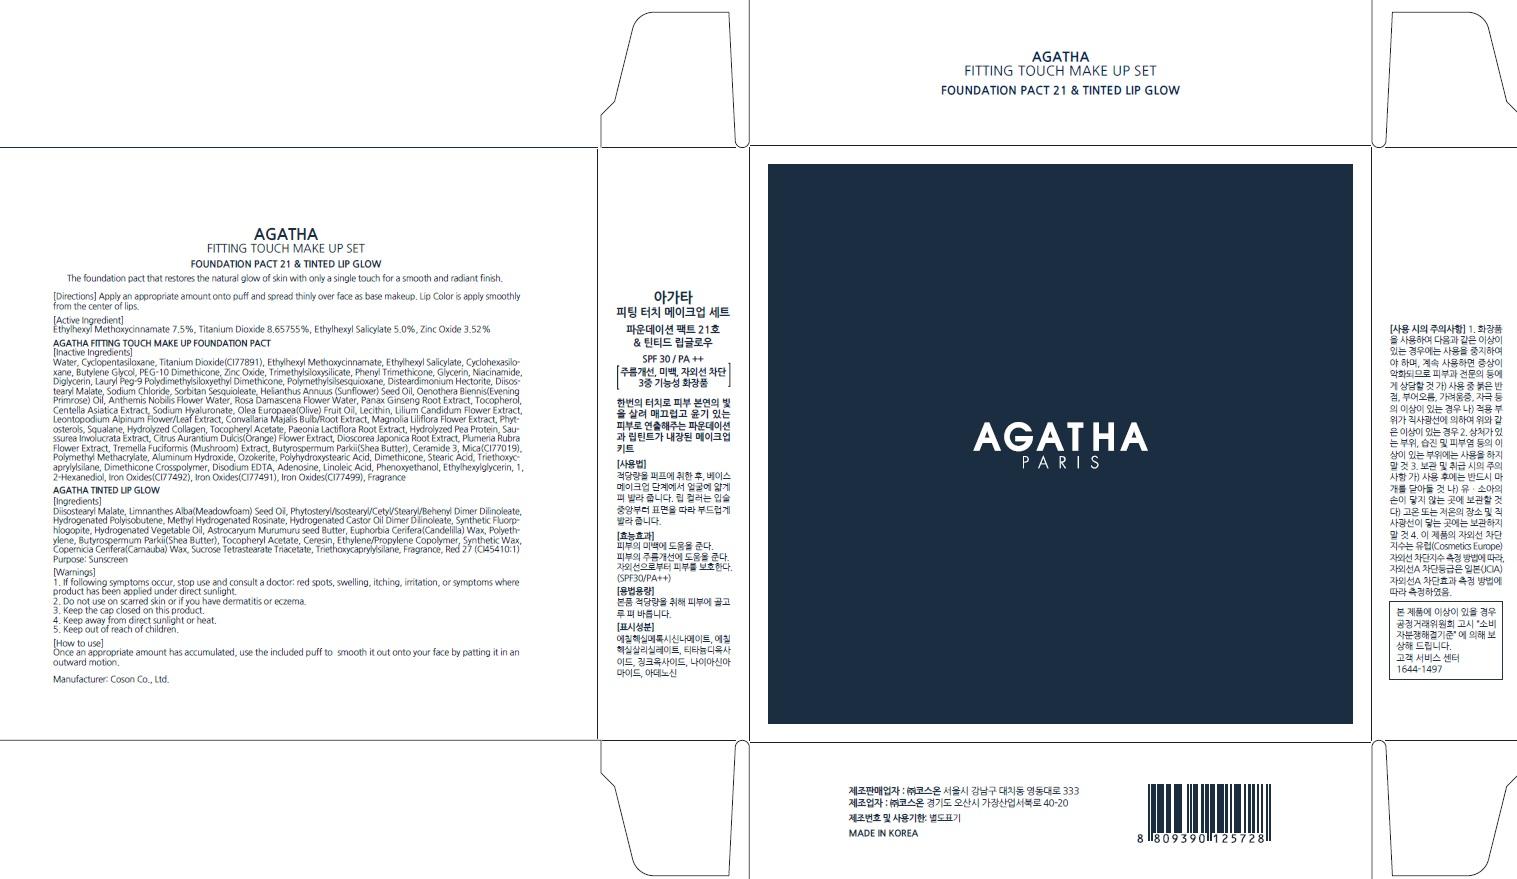 Agatha Fitting Touch Make Up Set | Octinoxate, Titanium Dioxide, Octisalate, Zinc Oxide Powder Breastfeeding